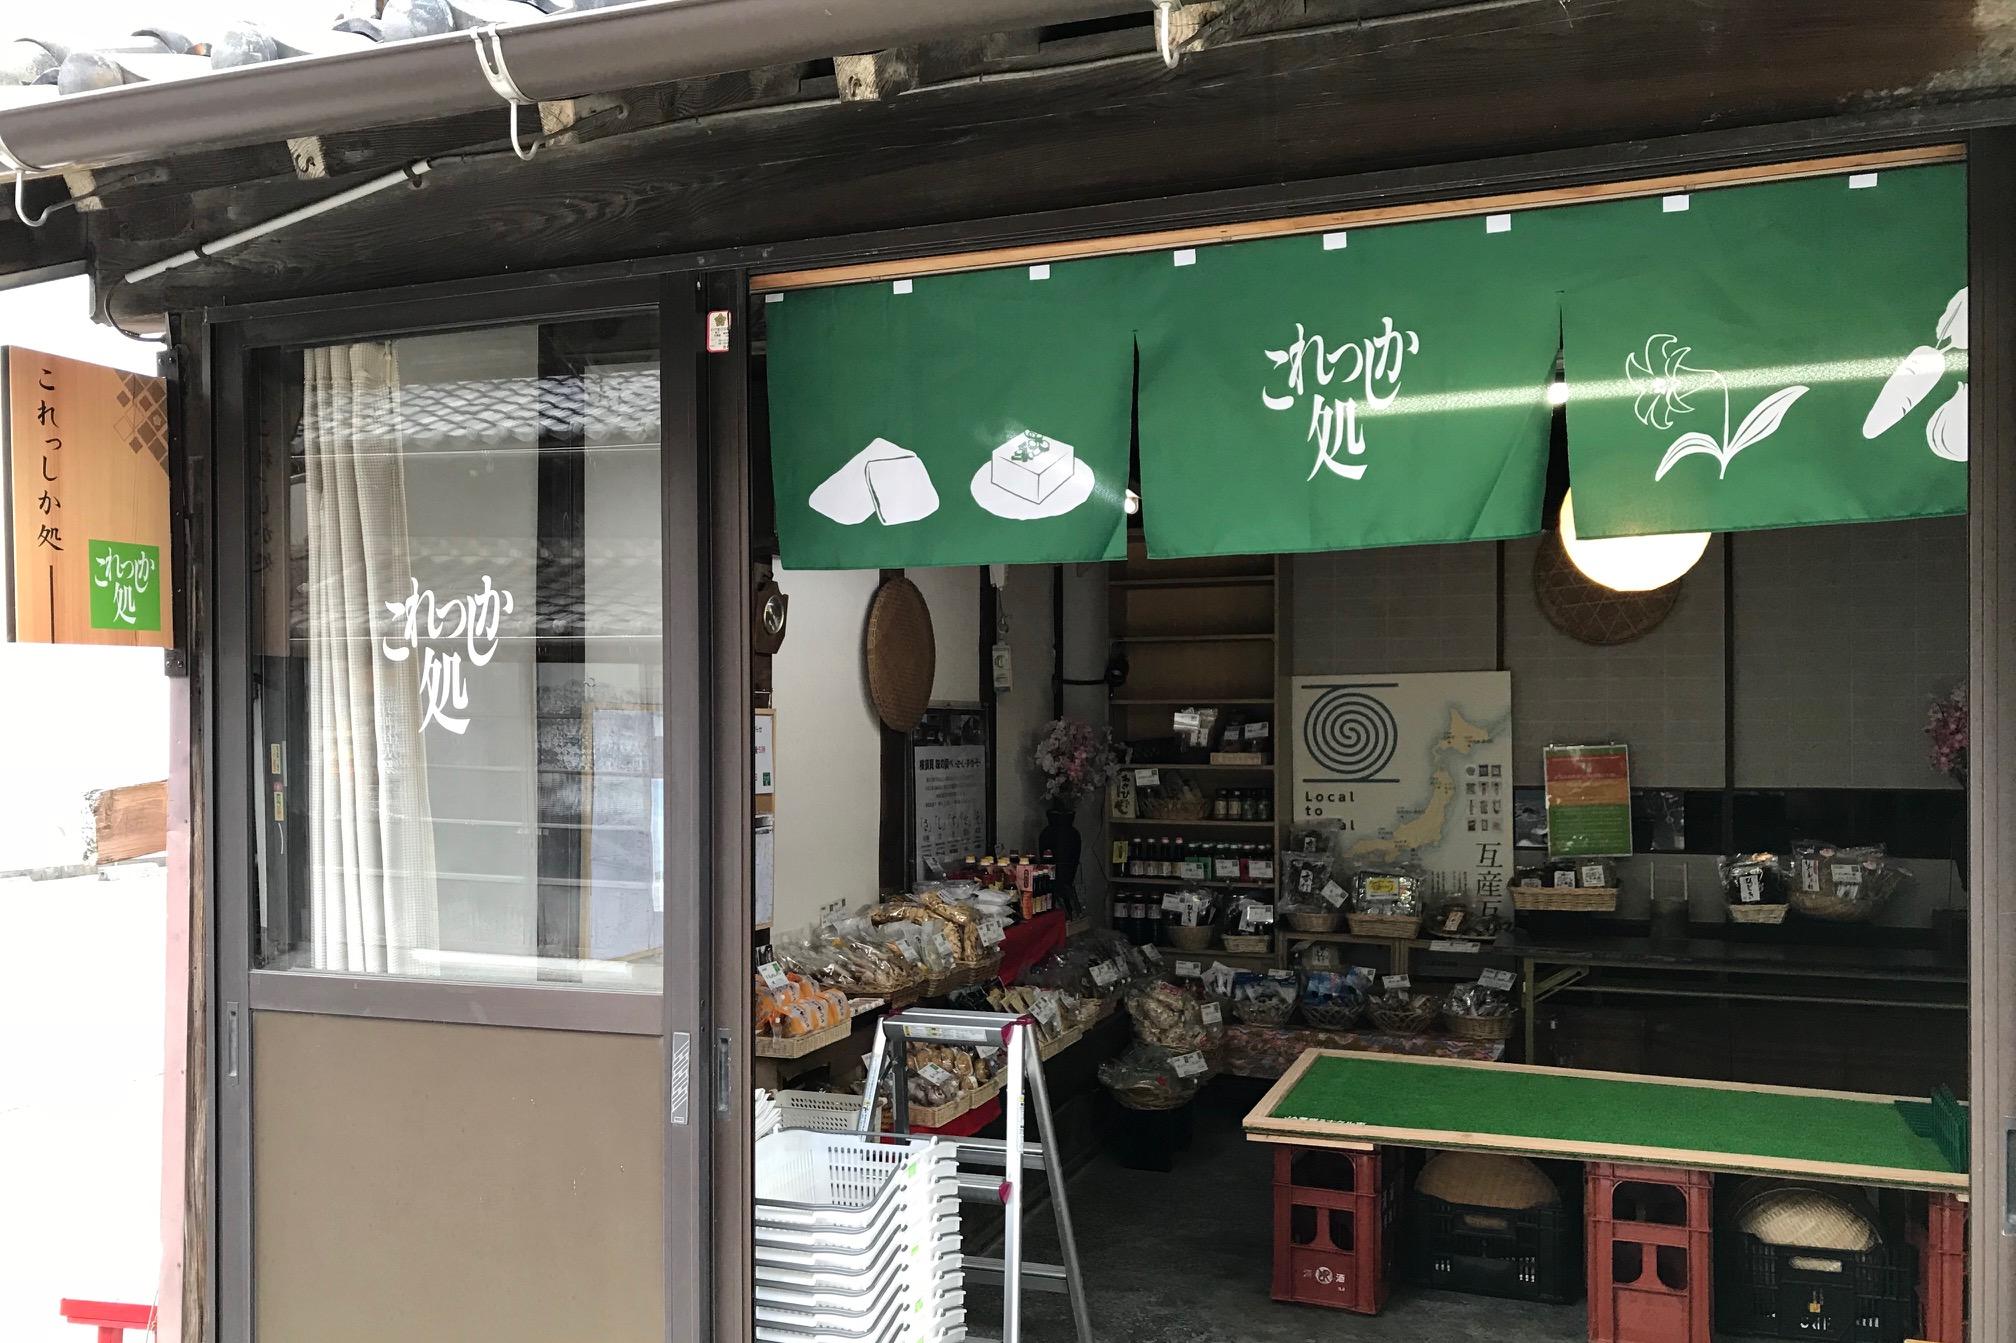 掛川市横須賀の空き店舗活用 | ZAZAmag.